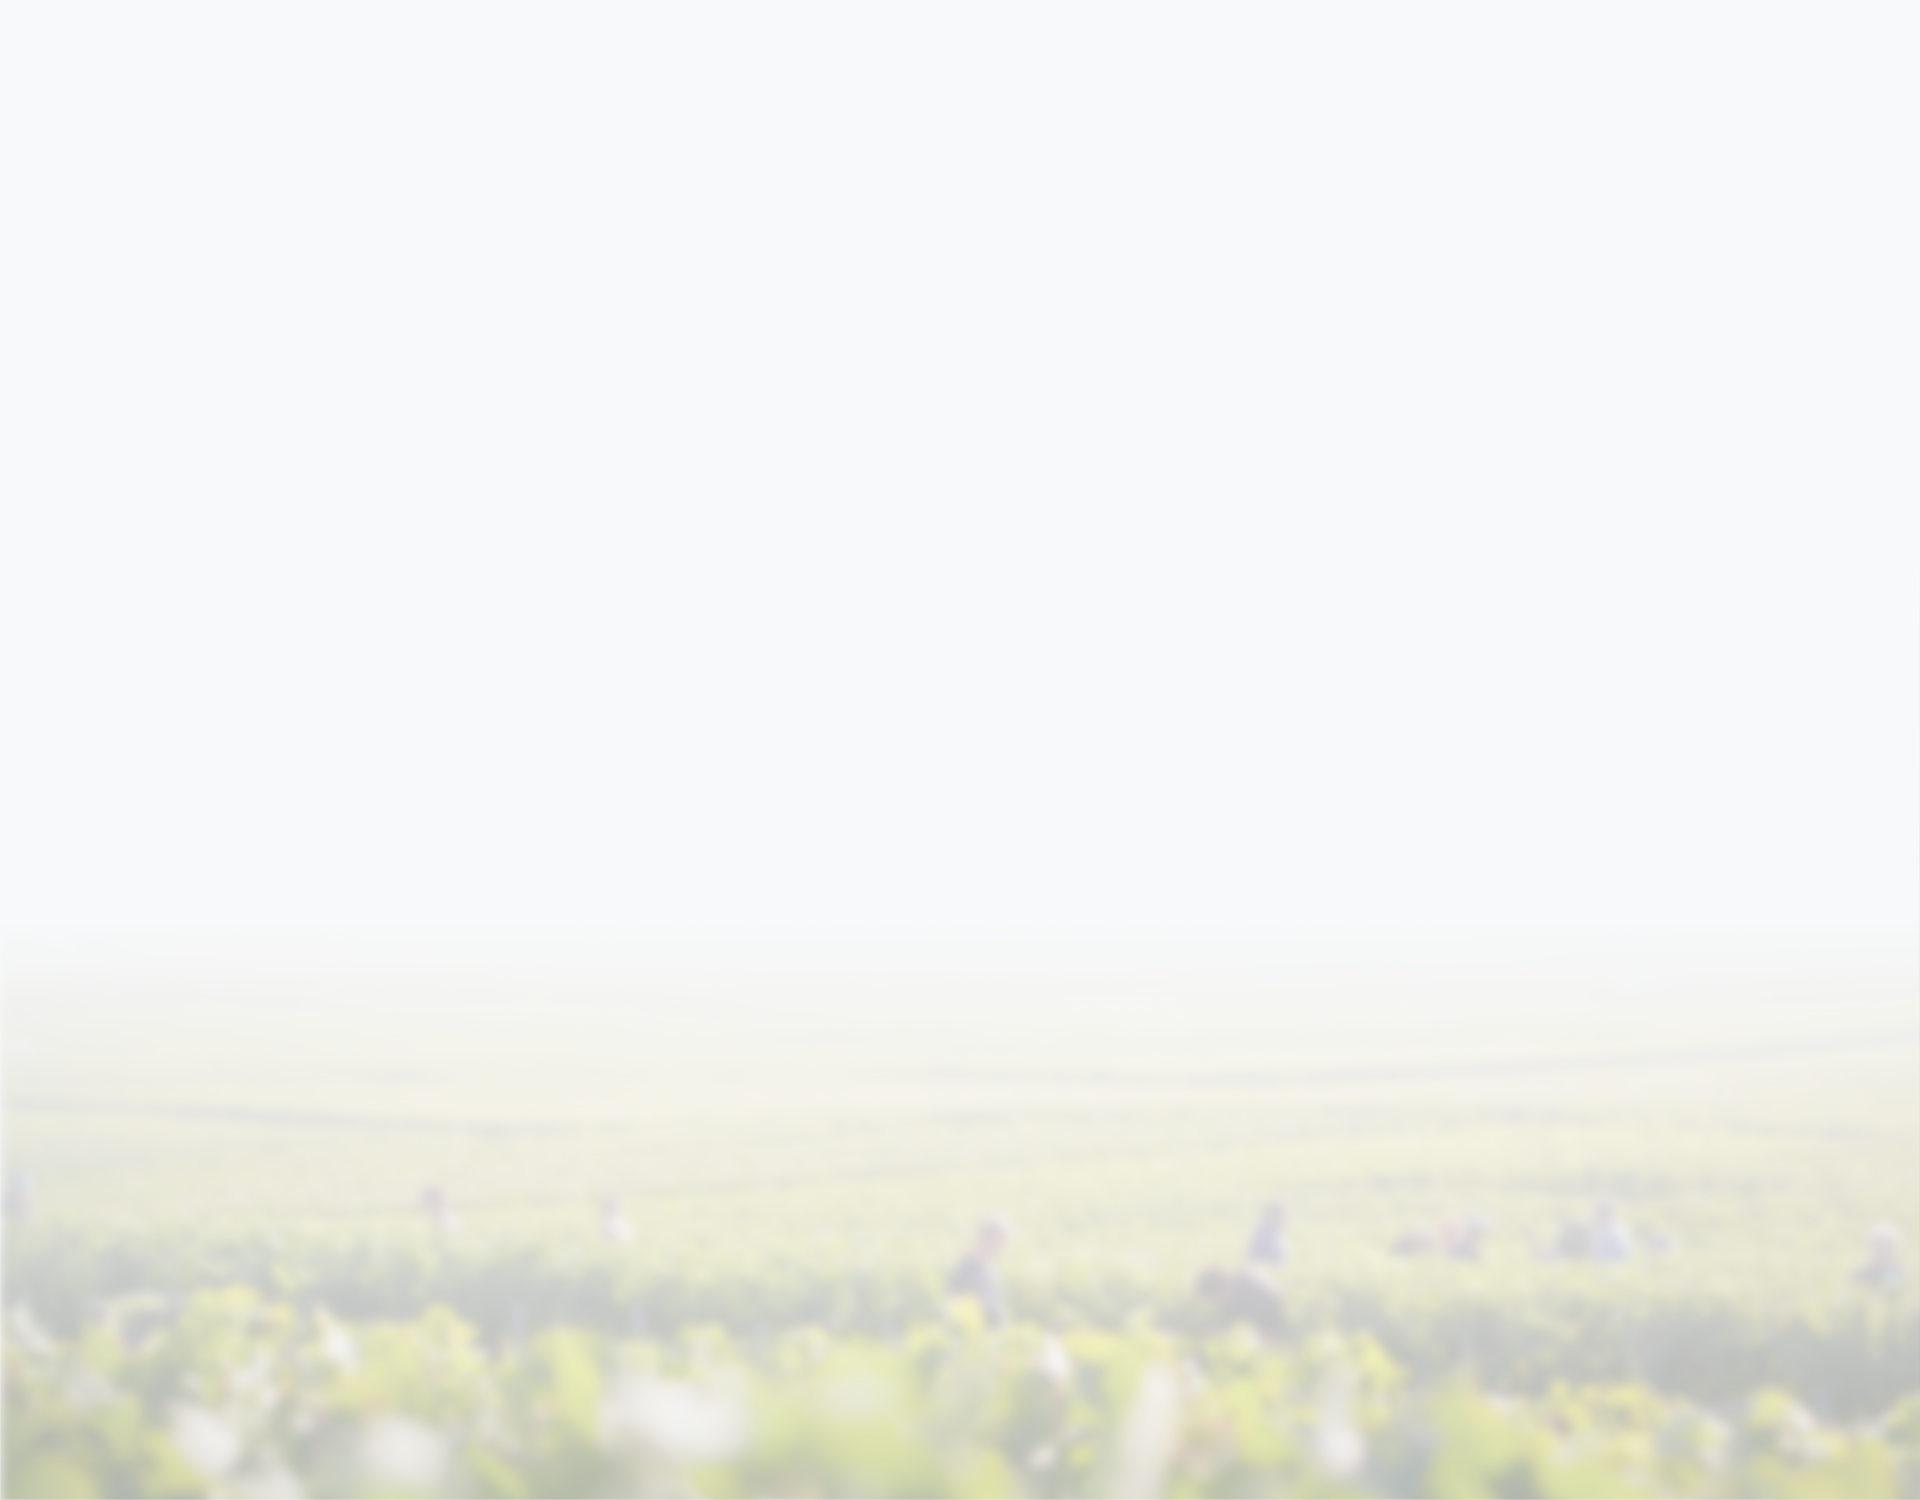 bg-sencrop-blur